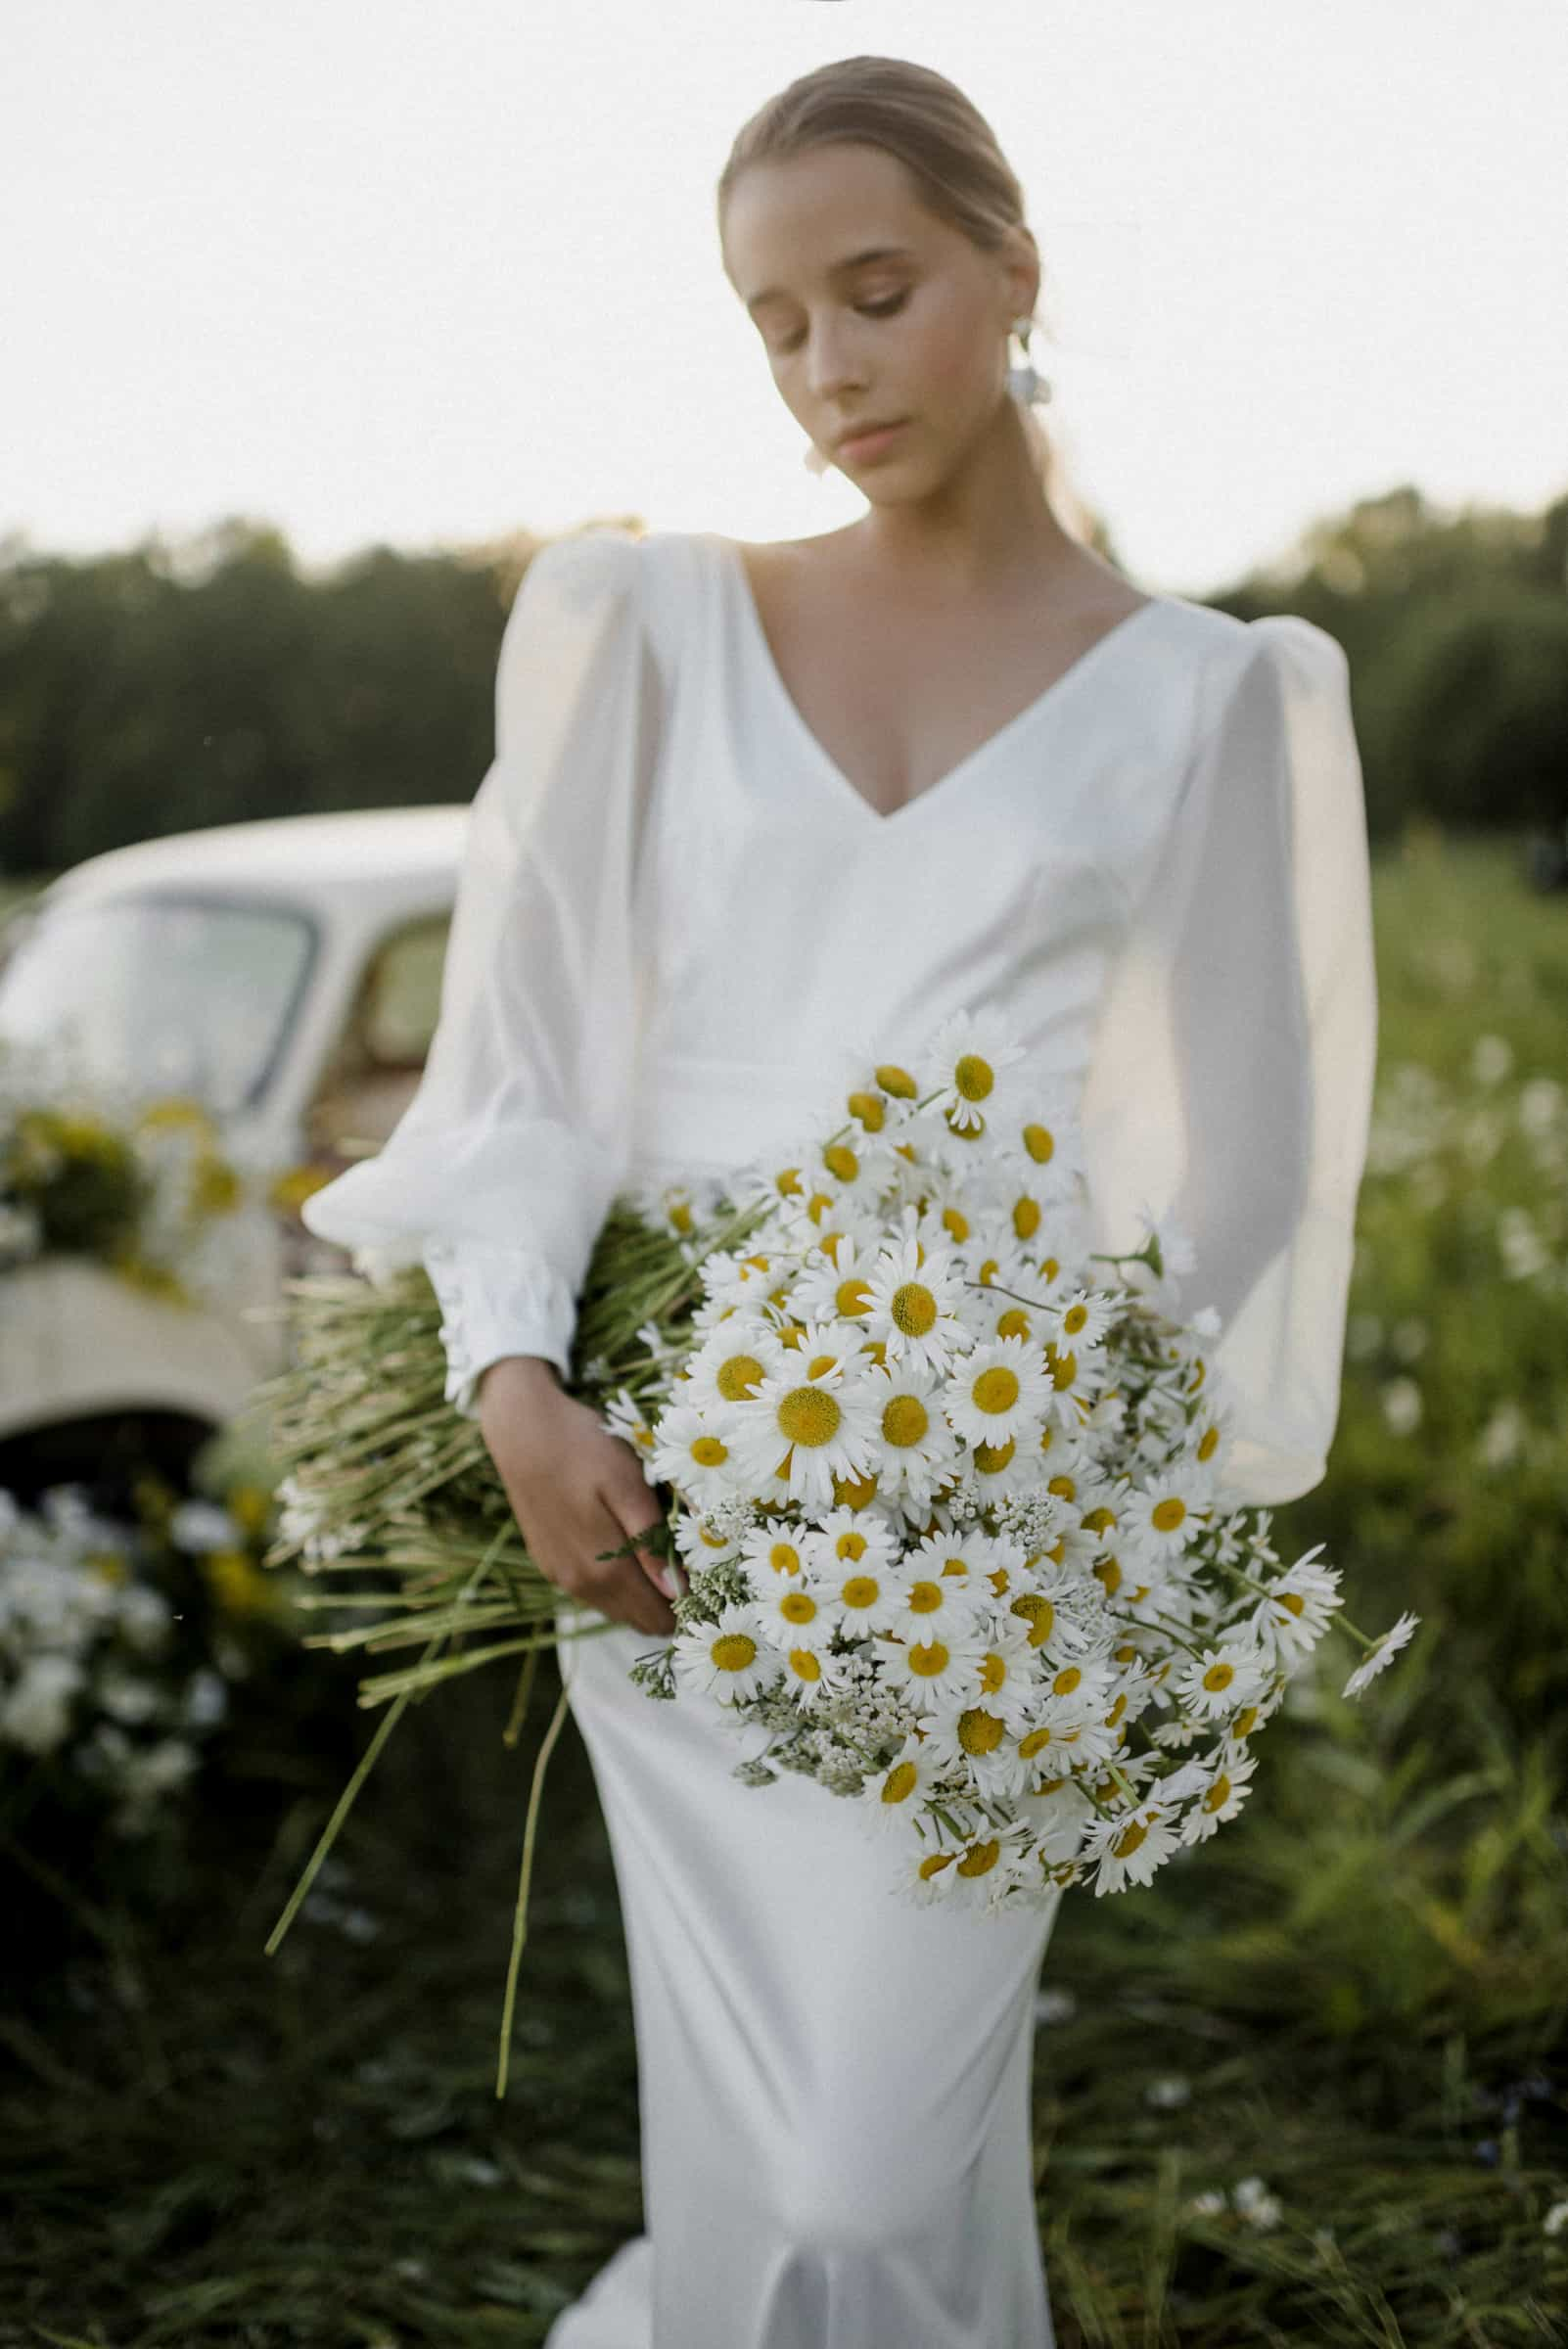 Vestido de novia con mangas abullonadas